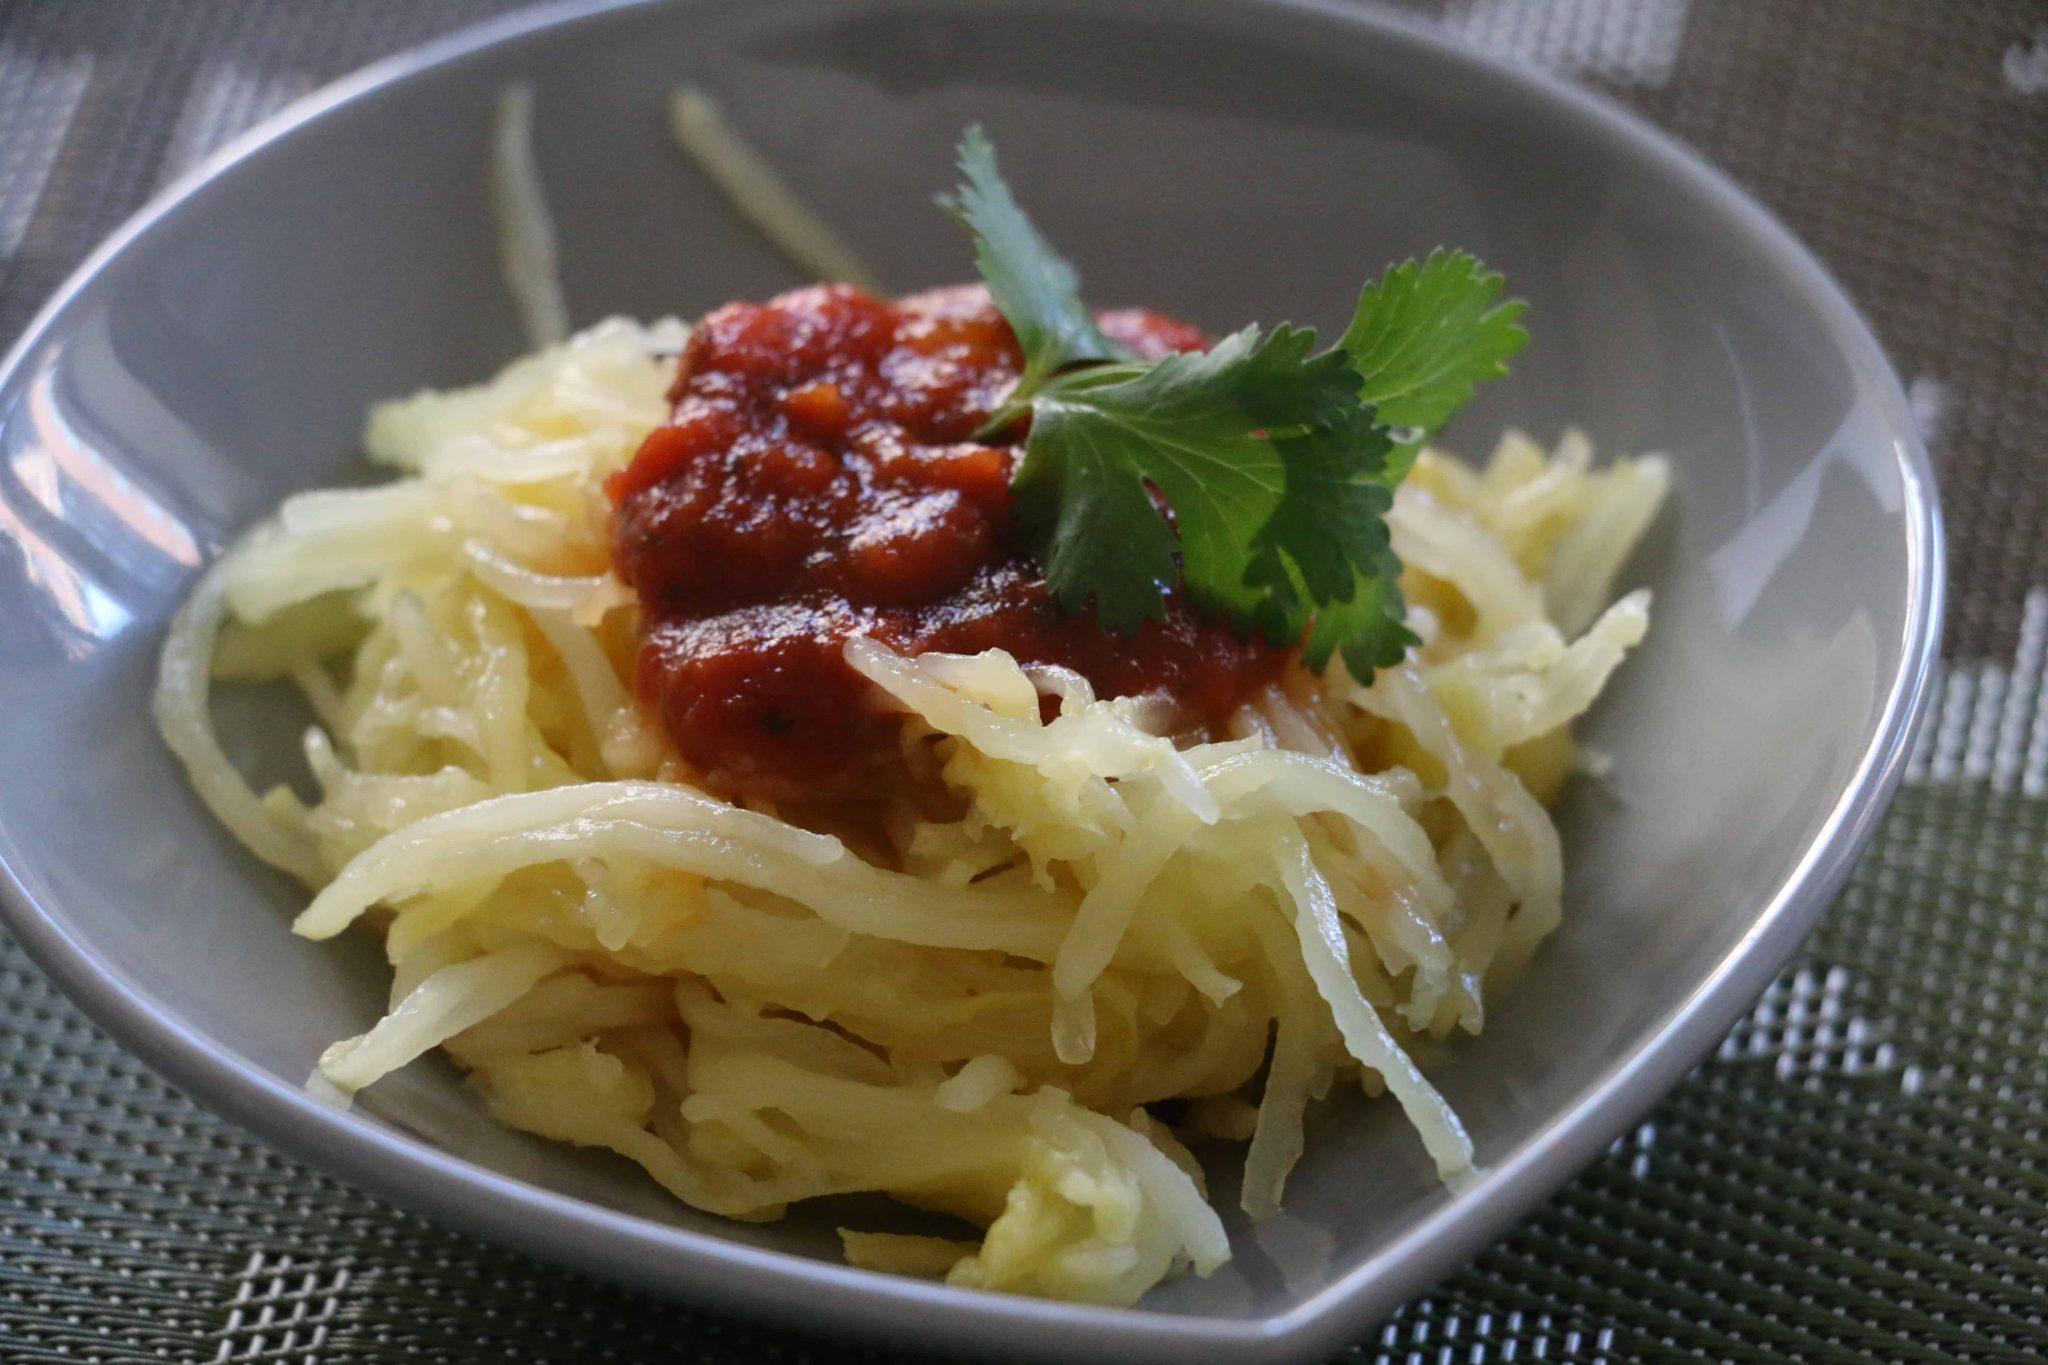 Spaghetti Squash with Tomato Sauce